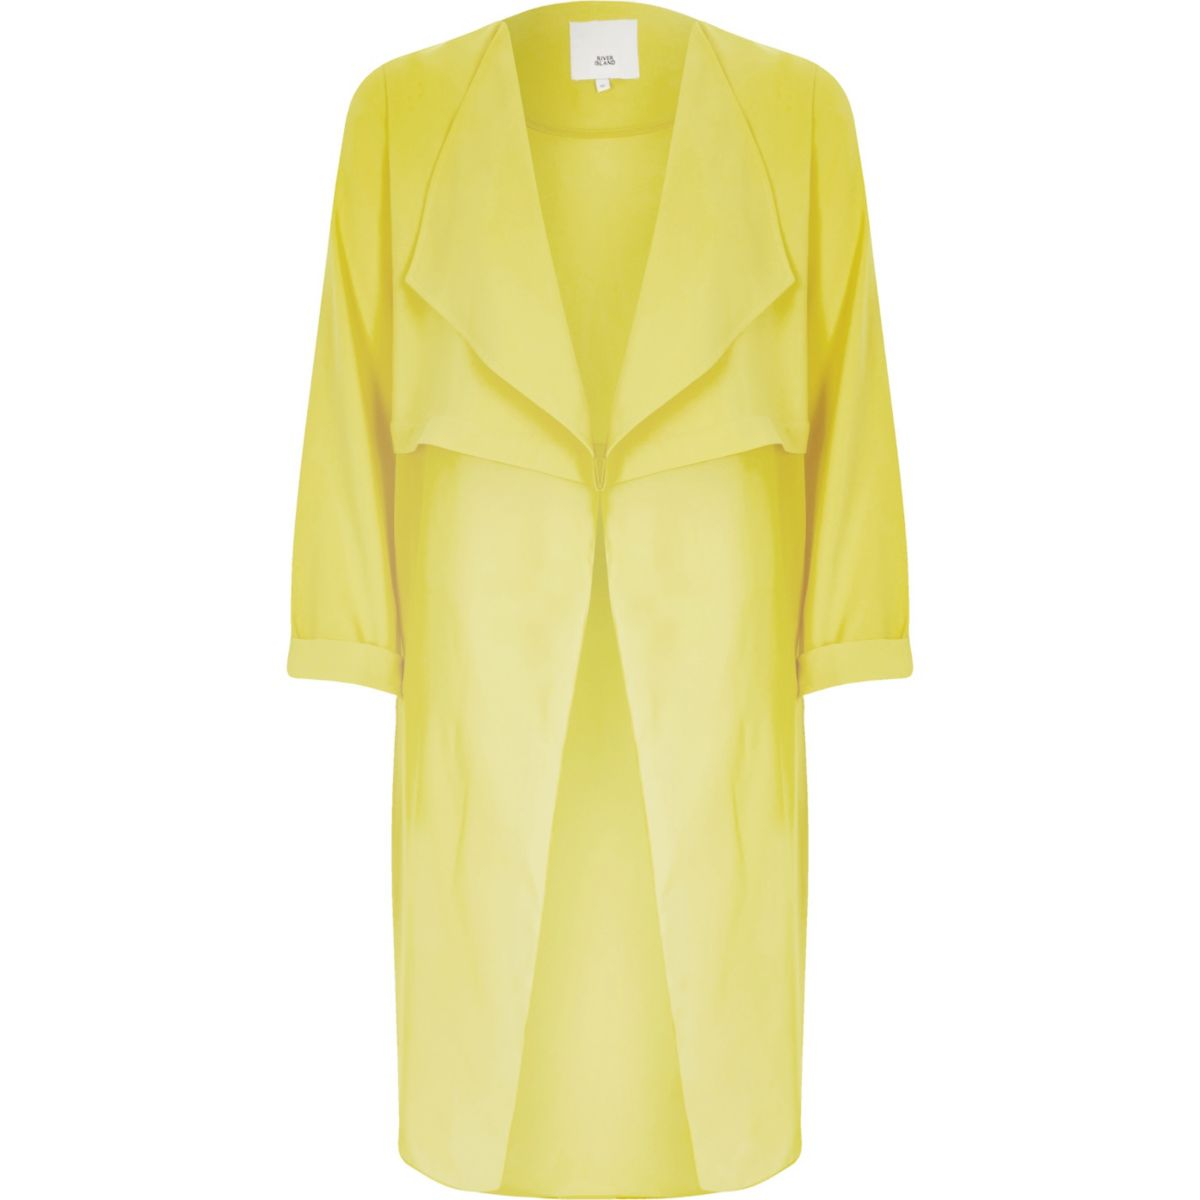 Yellow sheer detail duster jacket